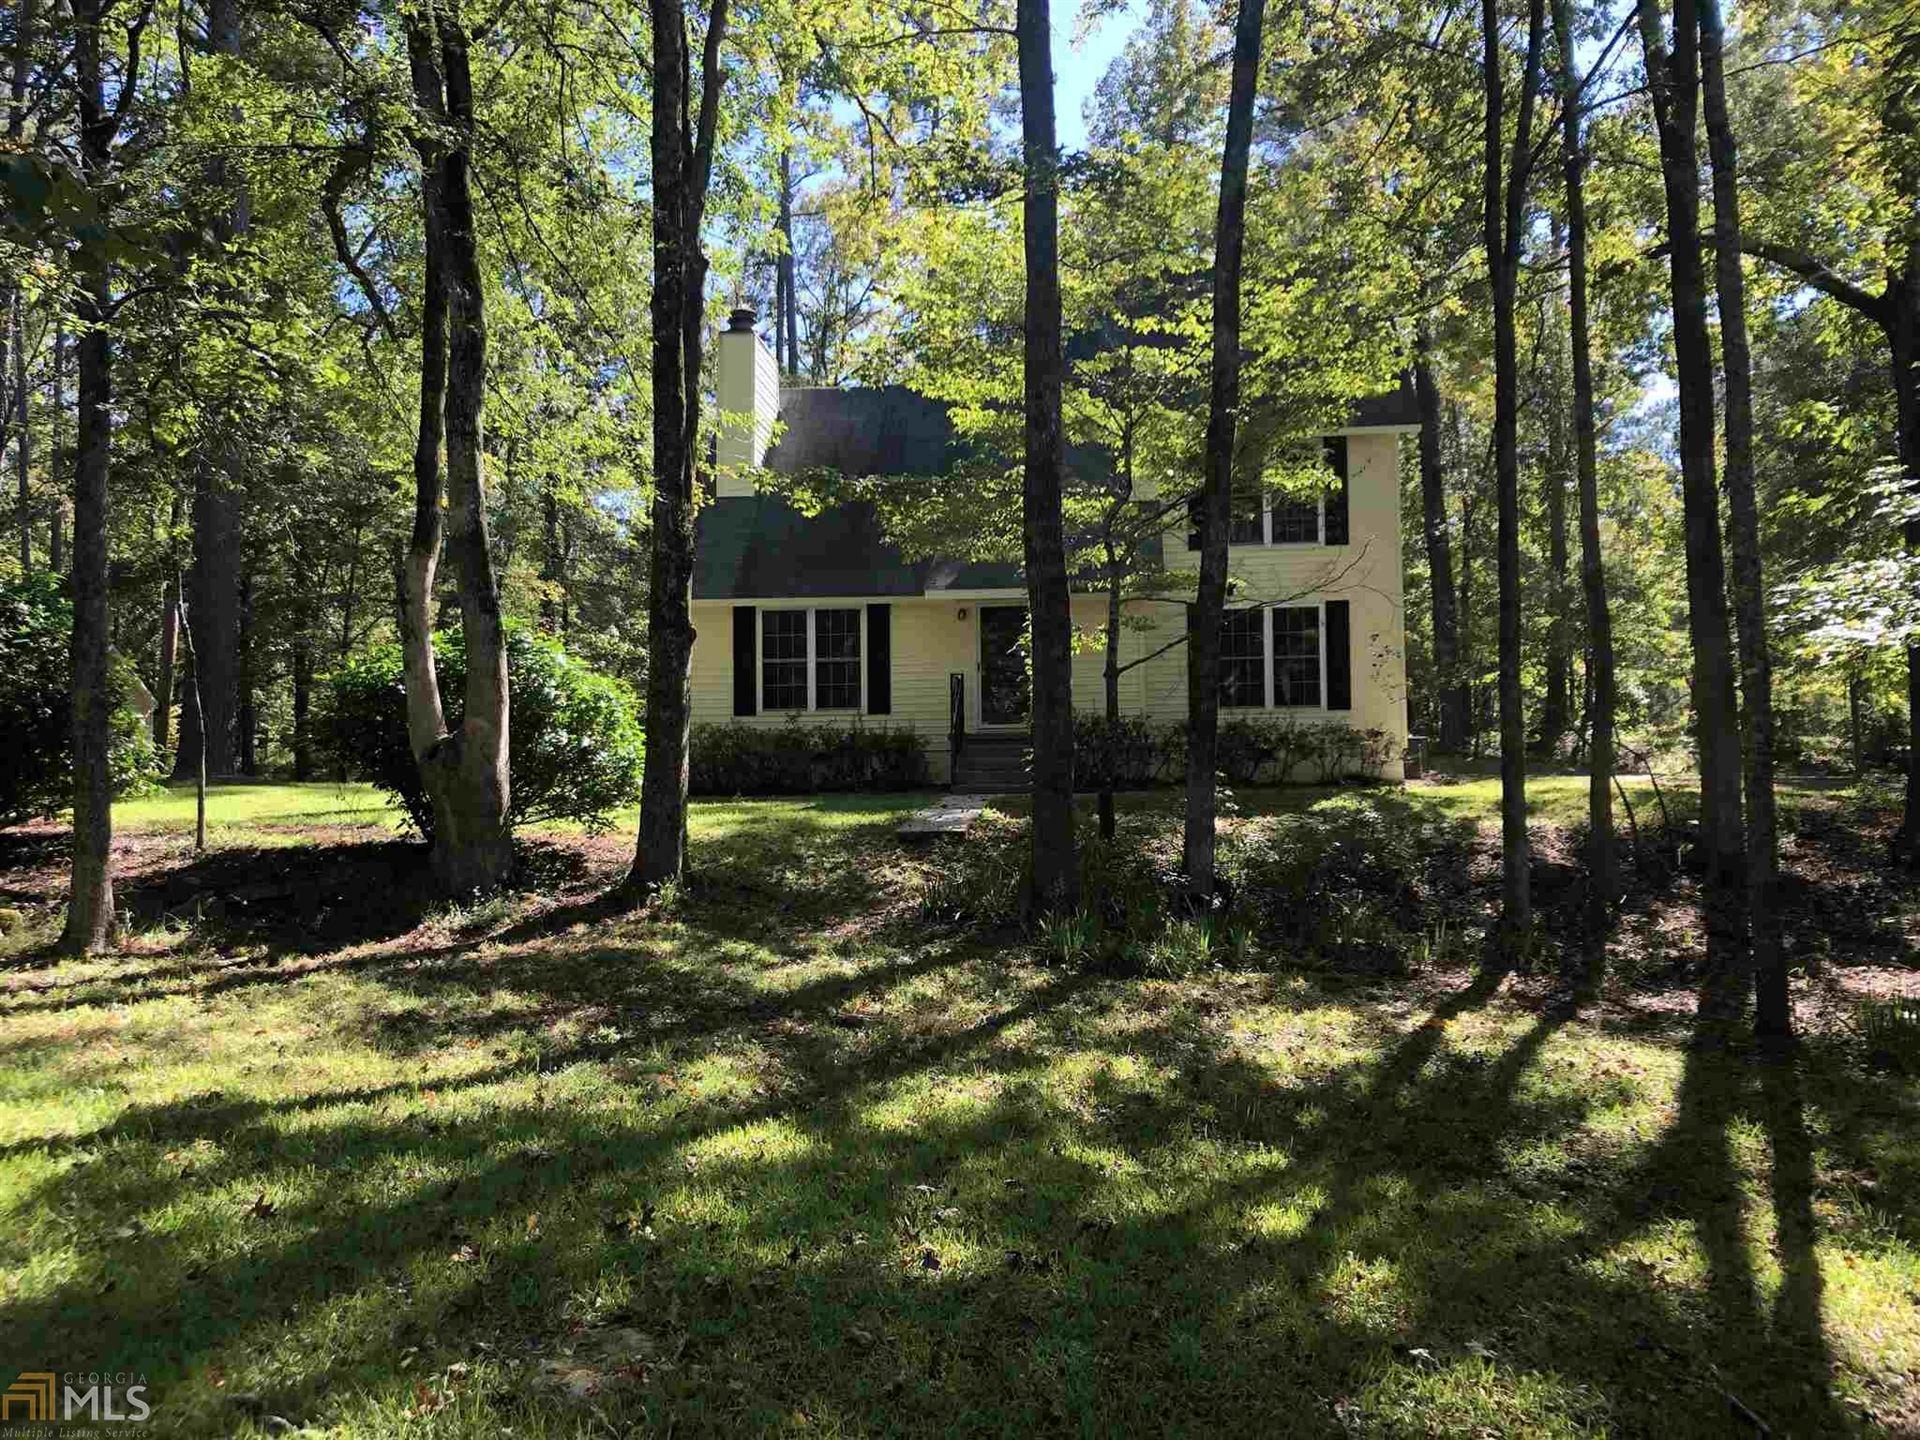 108 Oak Leaf Circl, Eatonton, GA 31024 - MLS#: 8866247